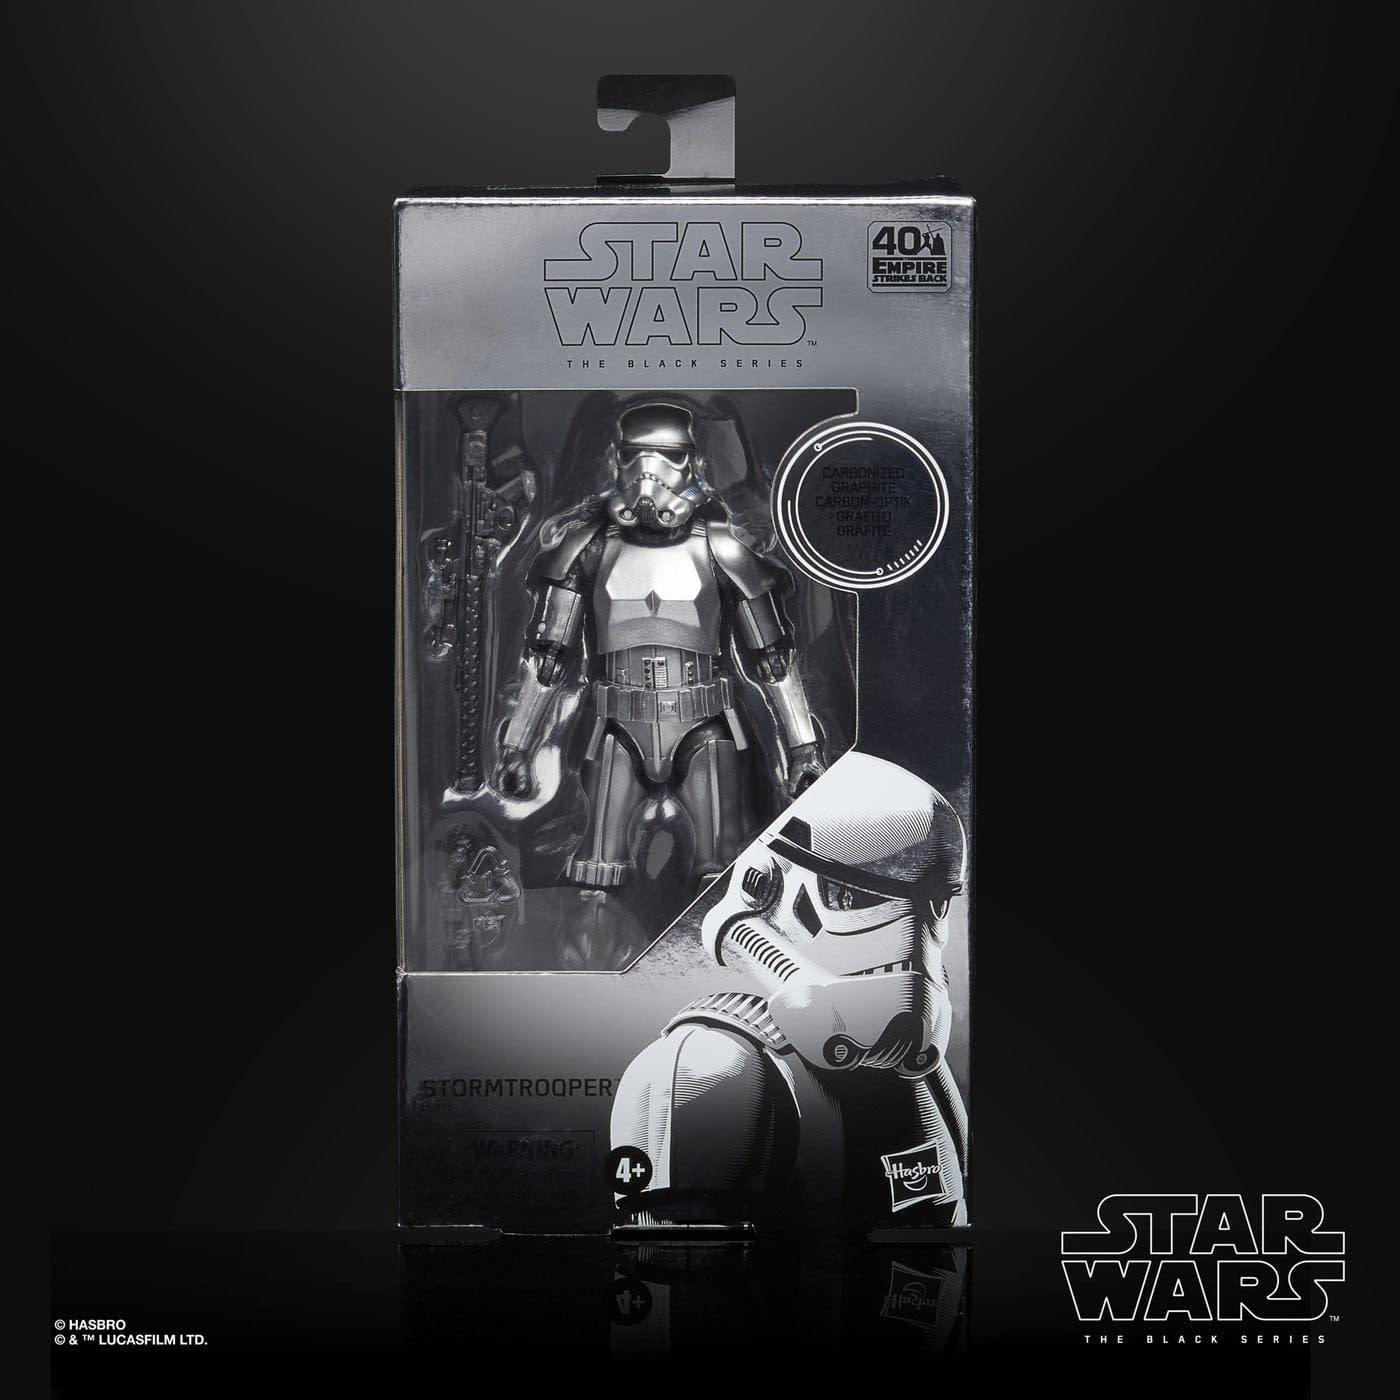 Star-Wars-Black-Series-Carbonized-Stormtrooper-001